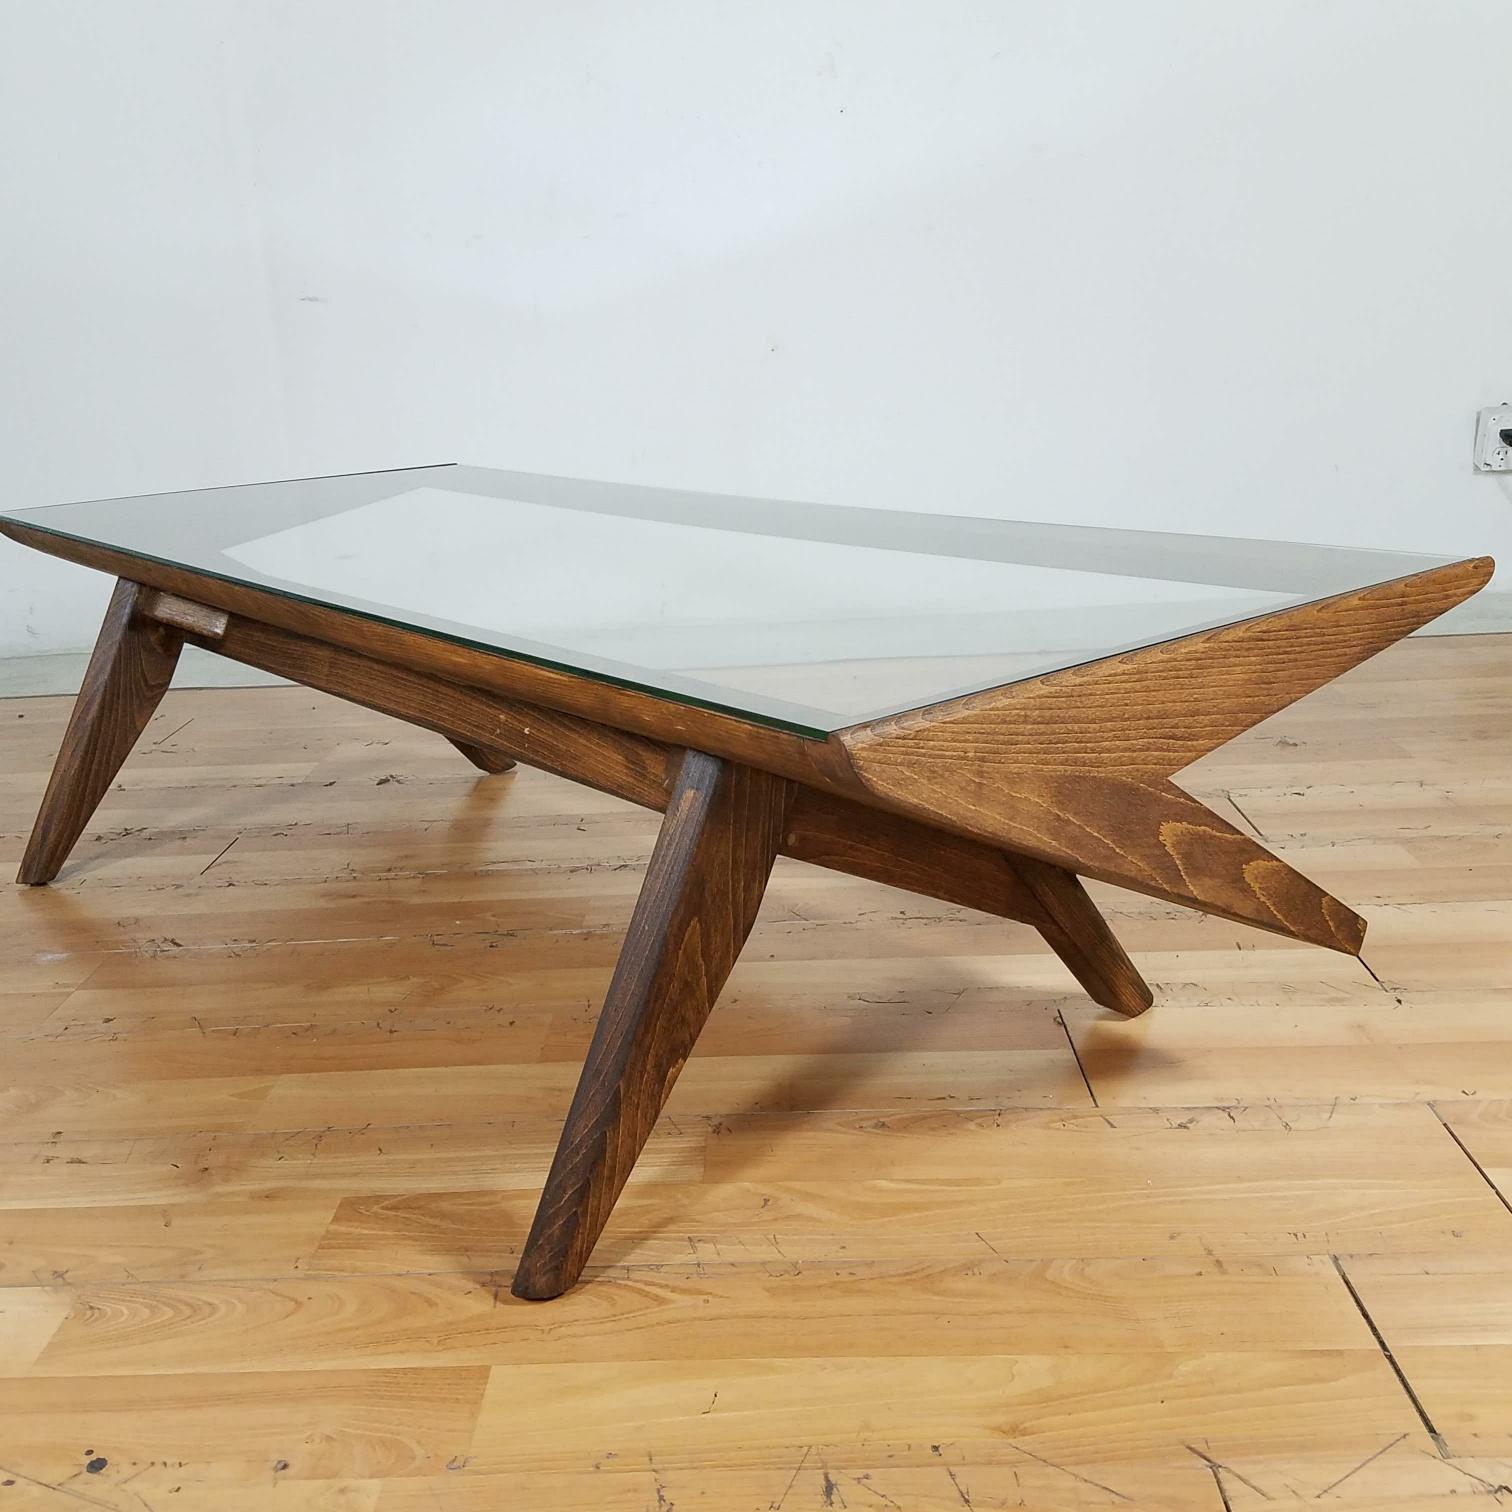 Merveilleux Nice Brown Saltman Furniture History #7   Brown U0026 Saltman Mid Century Z  Coffee Table   Image 5 Of 10